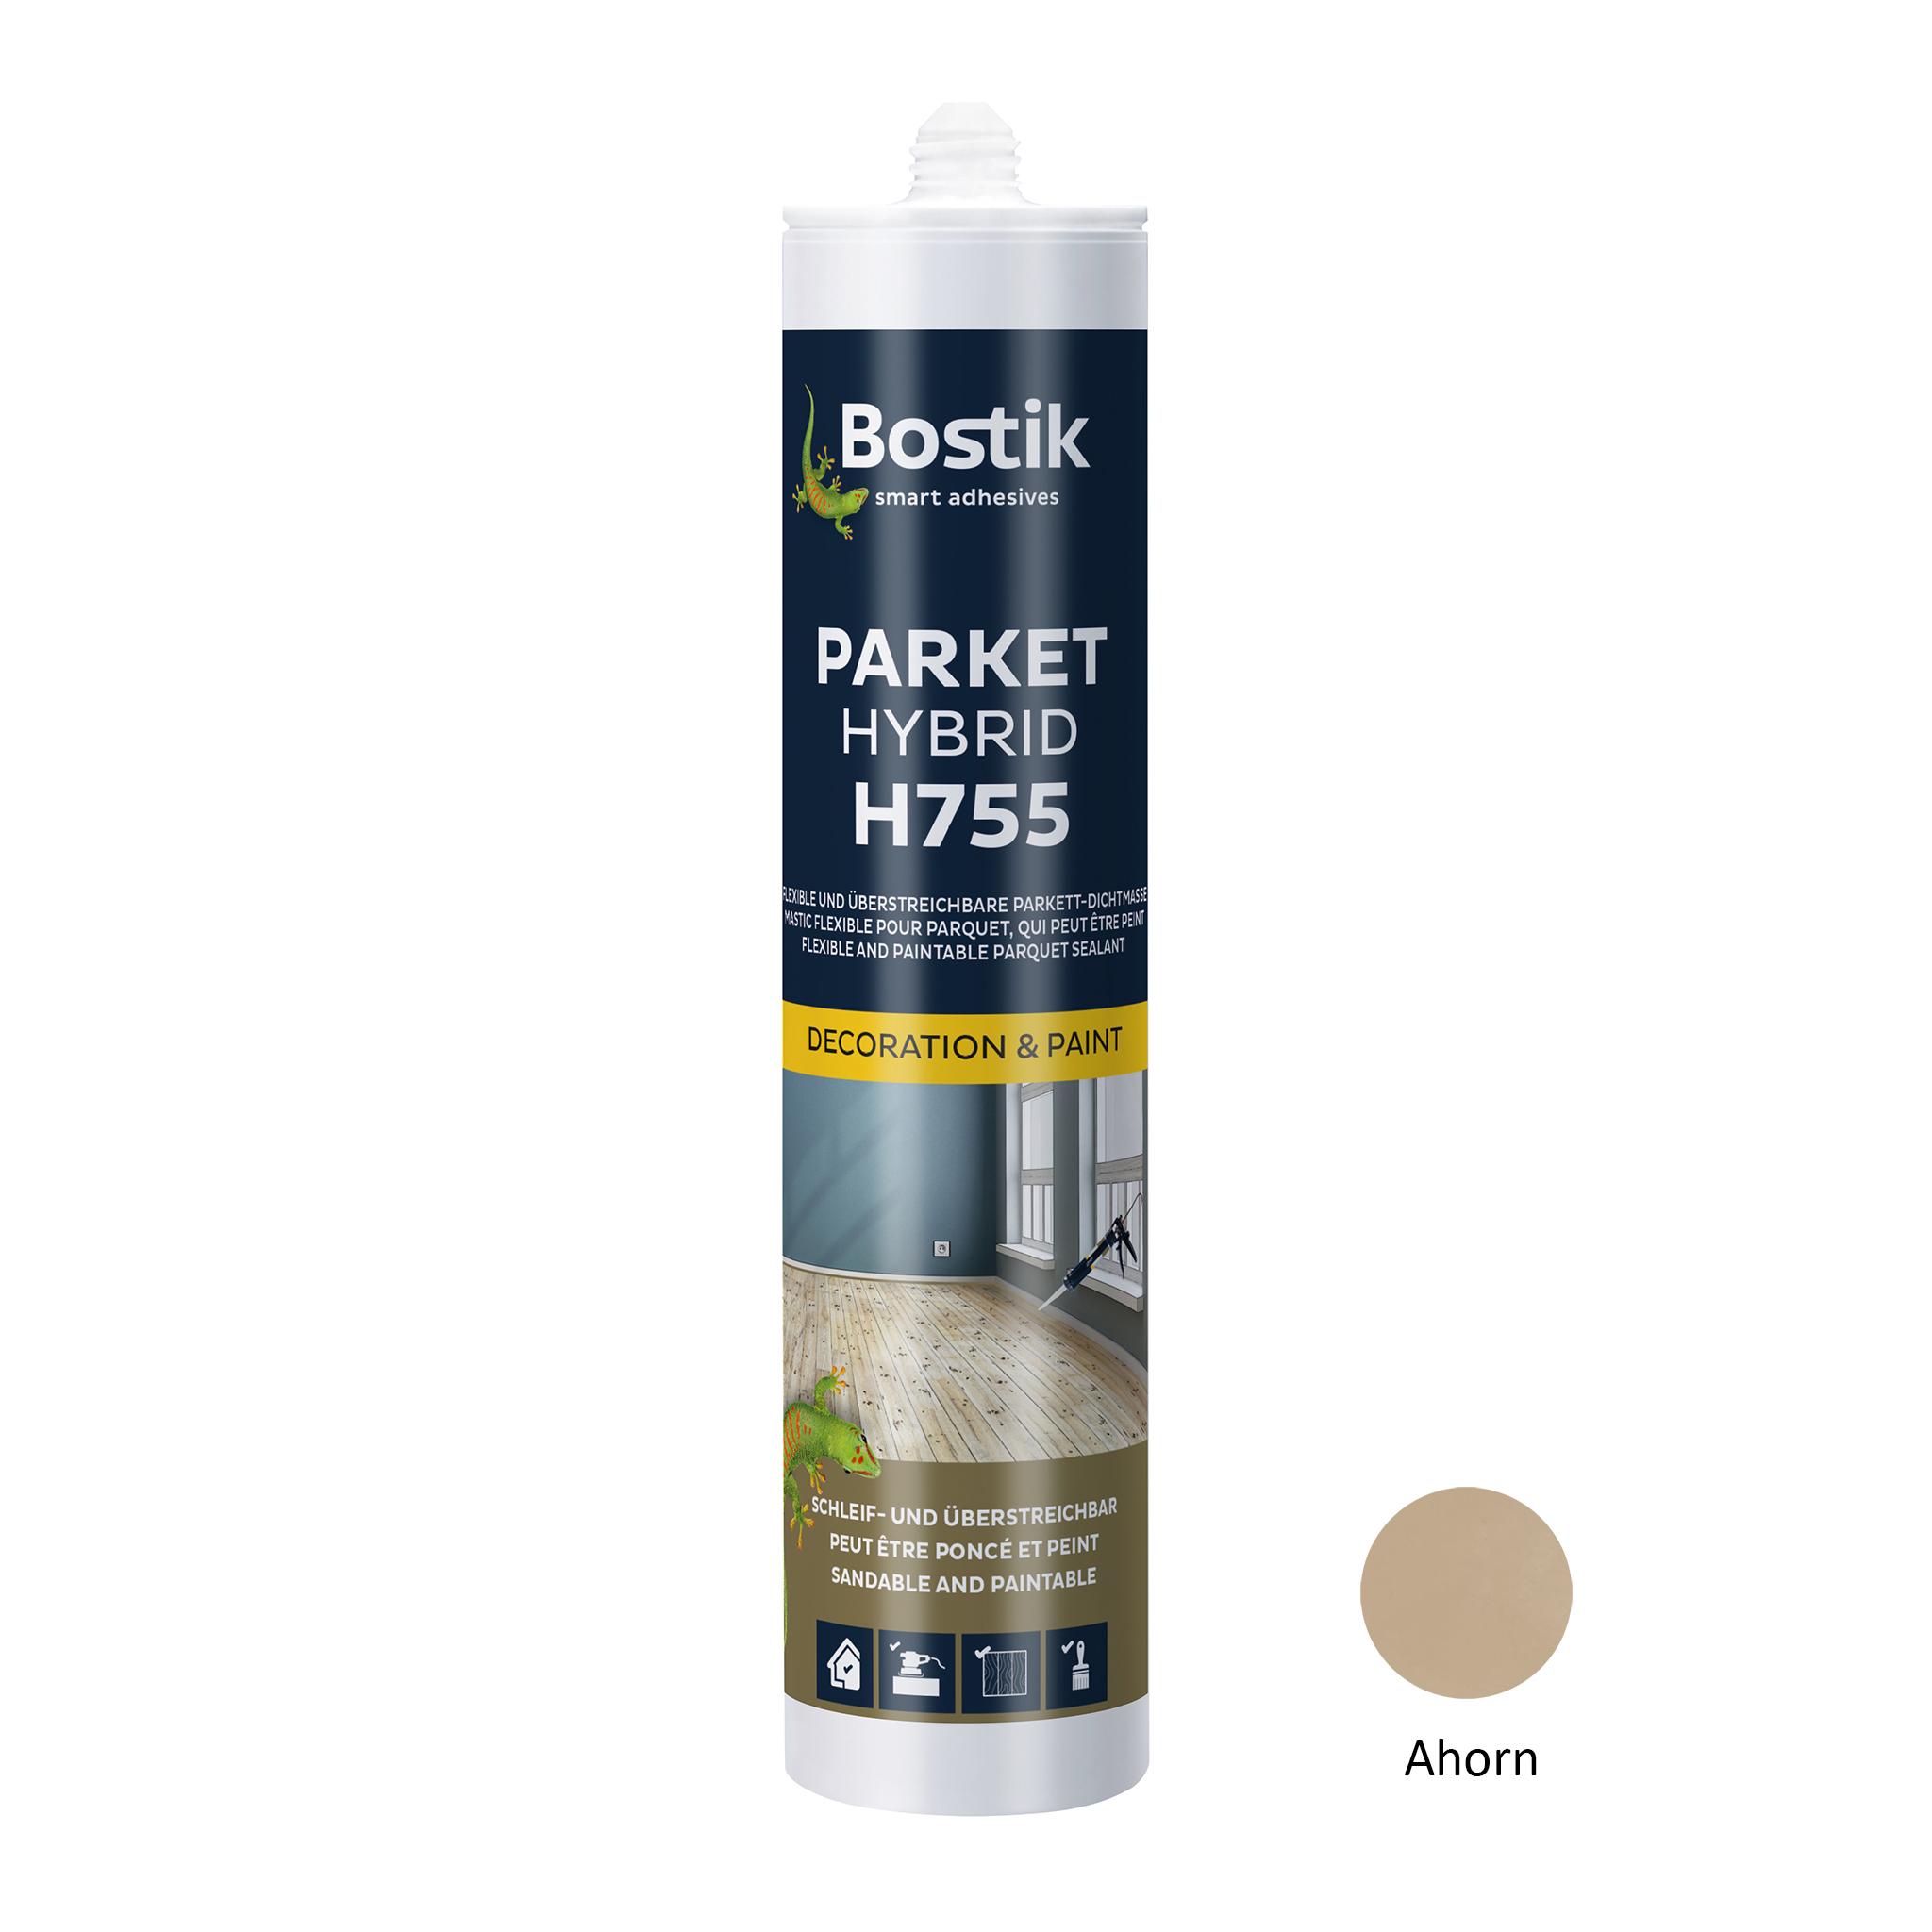 Bostik H755 Parkett Hybrid Ahorn